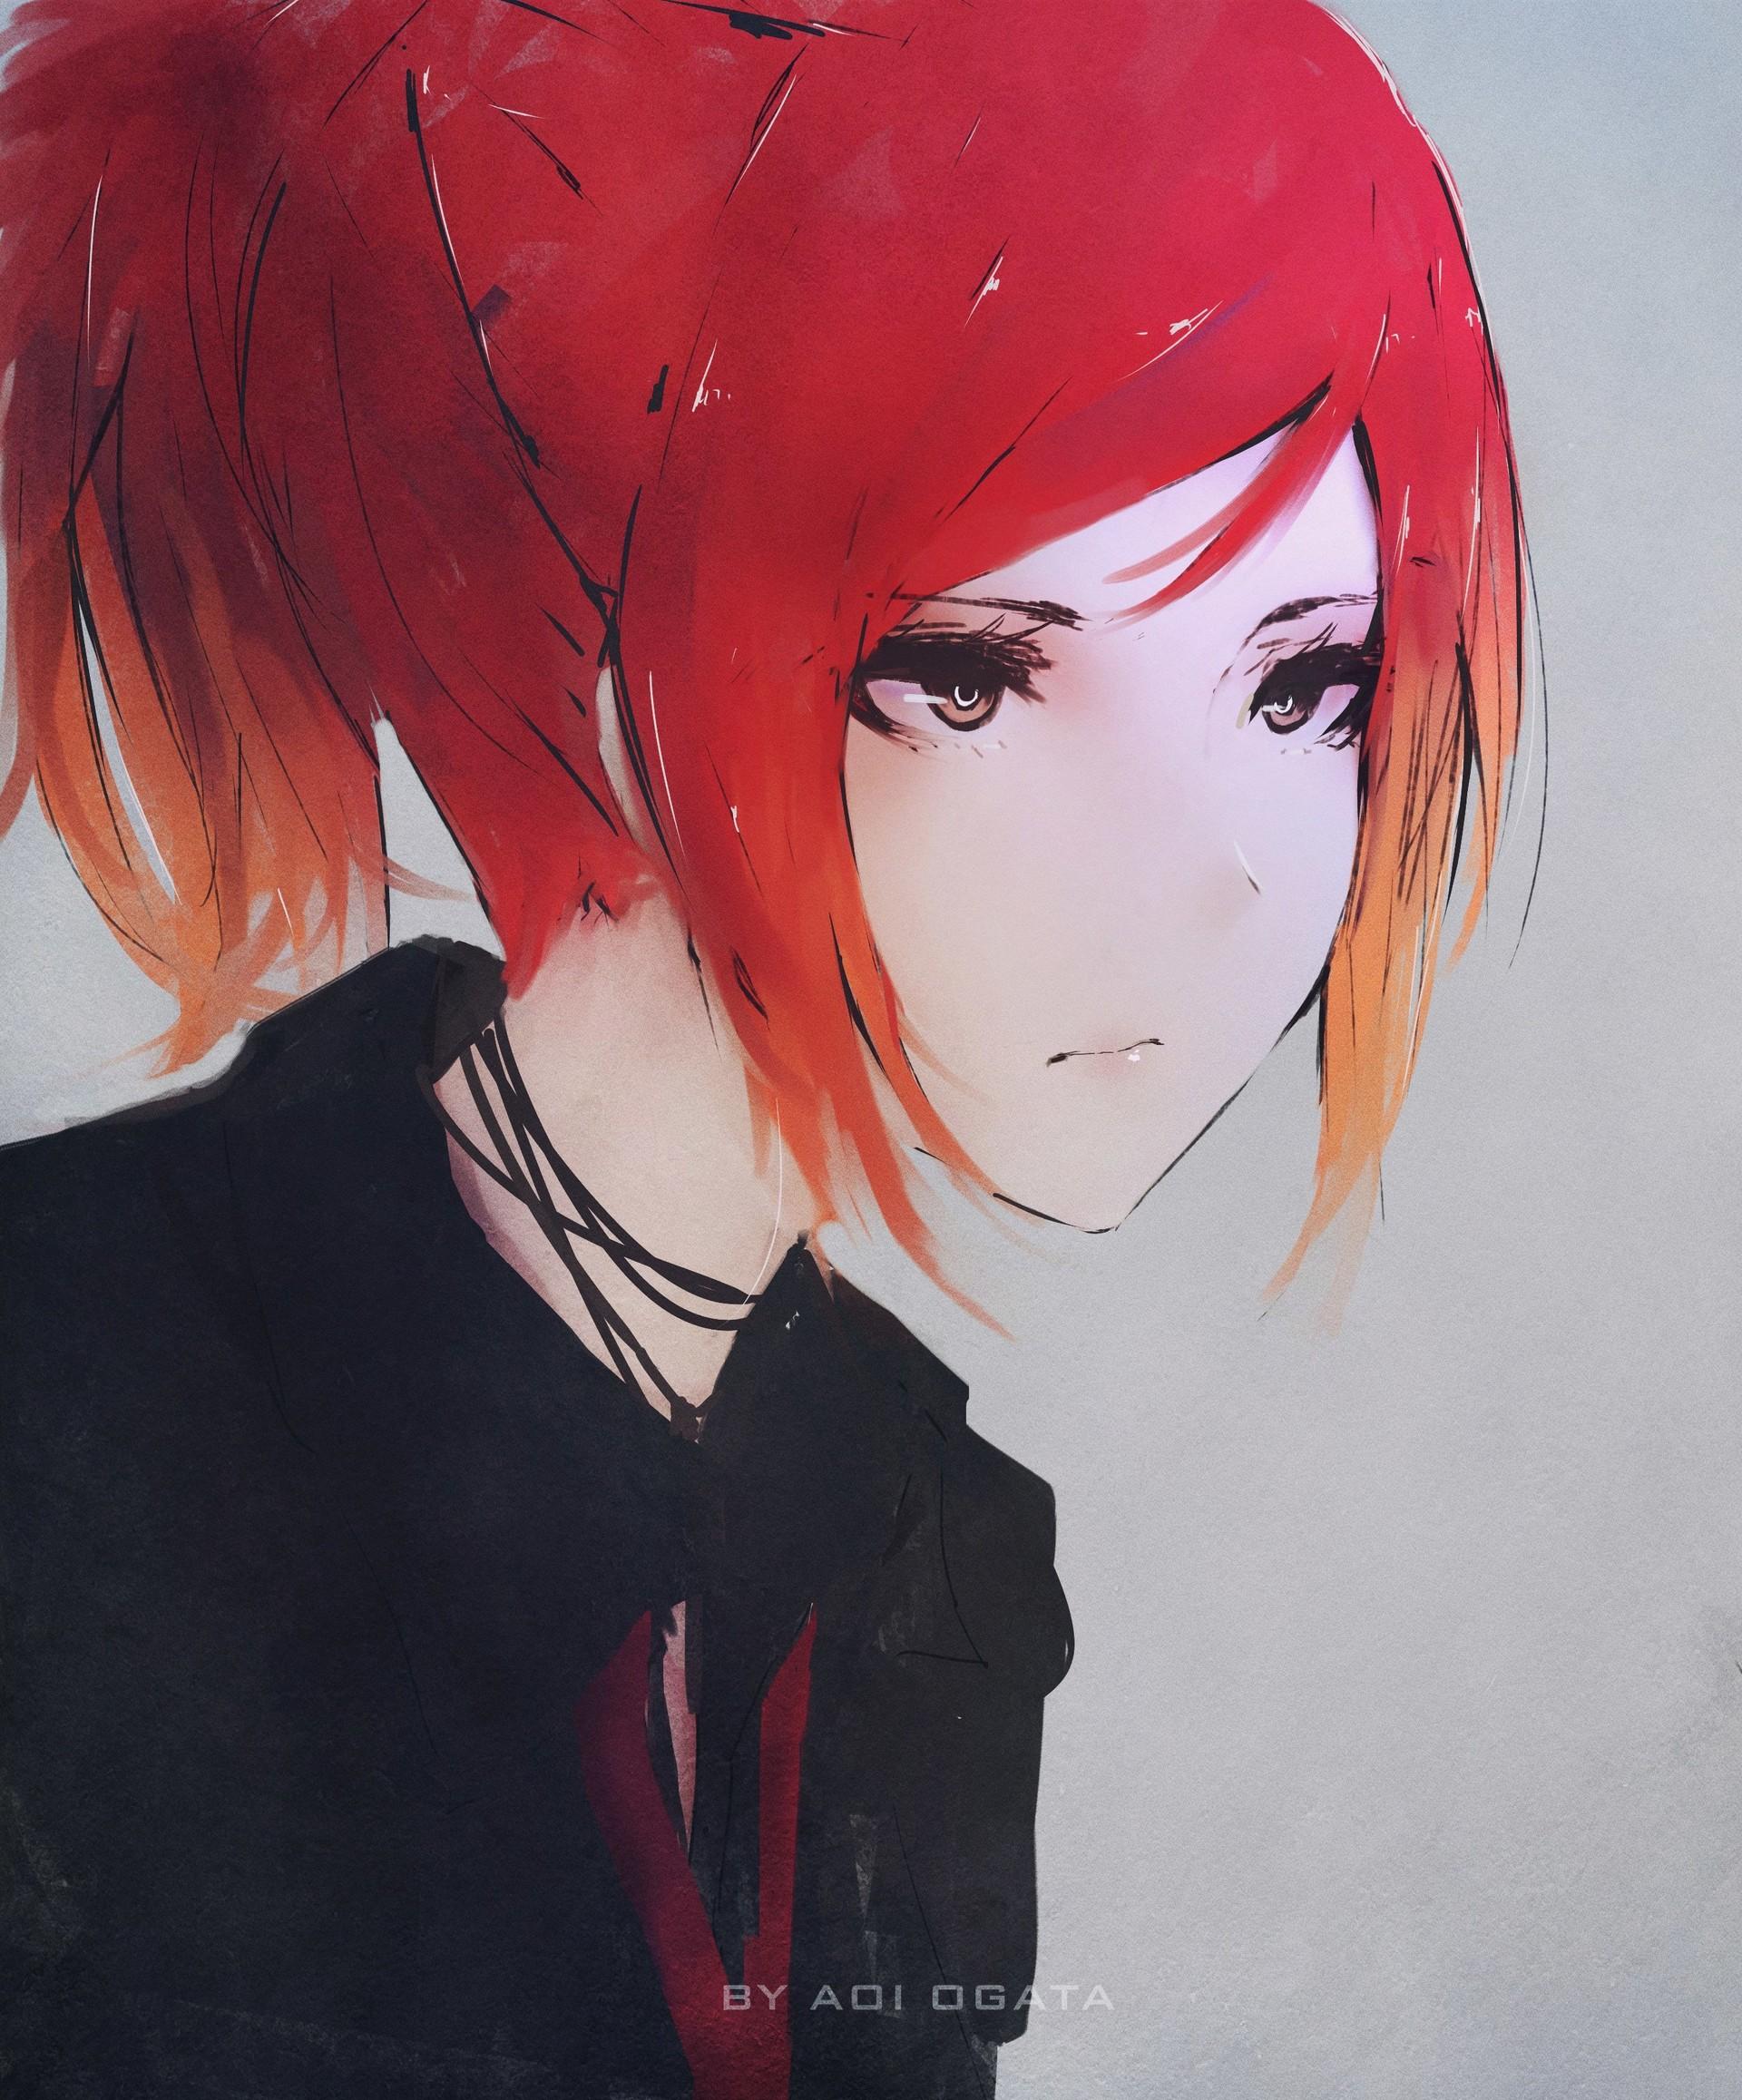 Aoi ogata asskyaruurlow